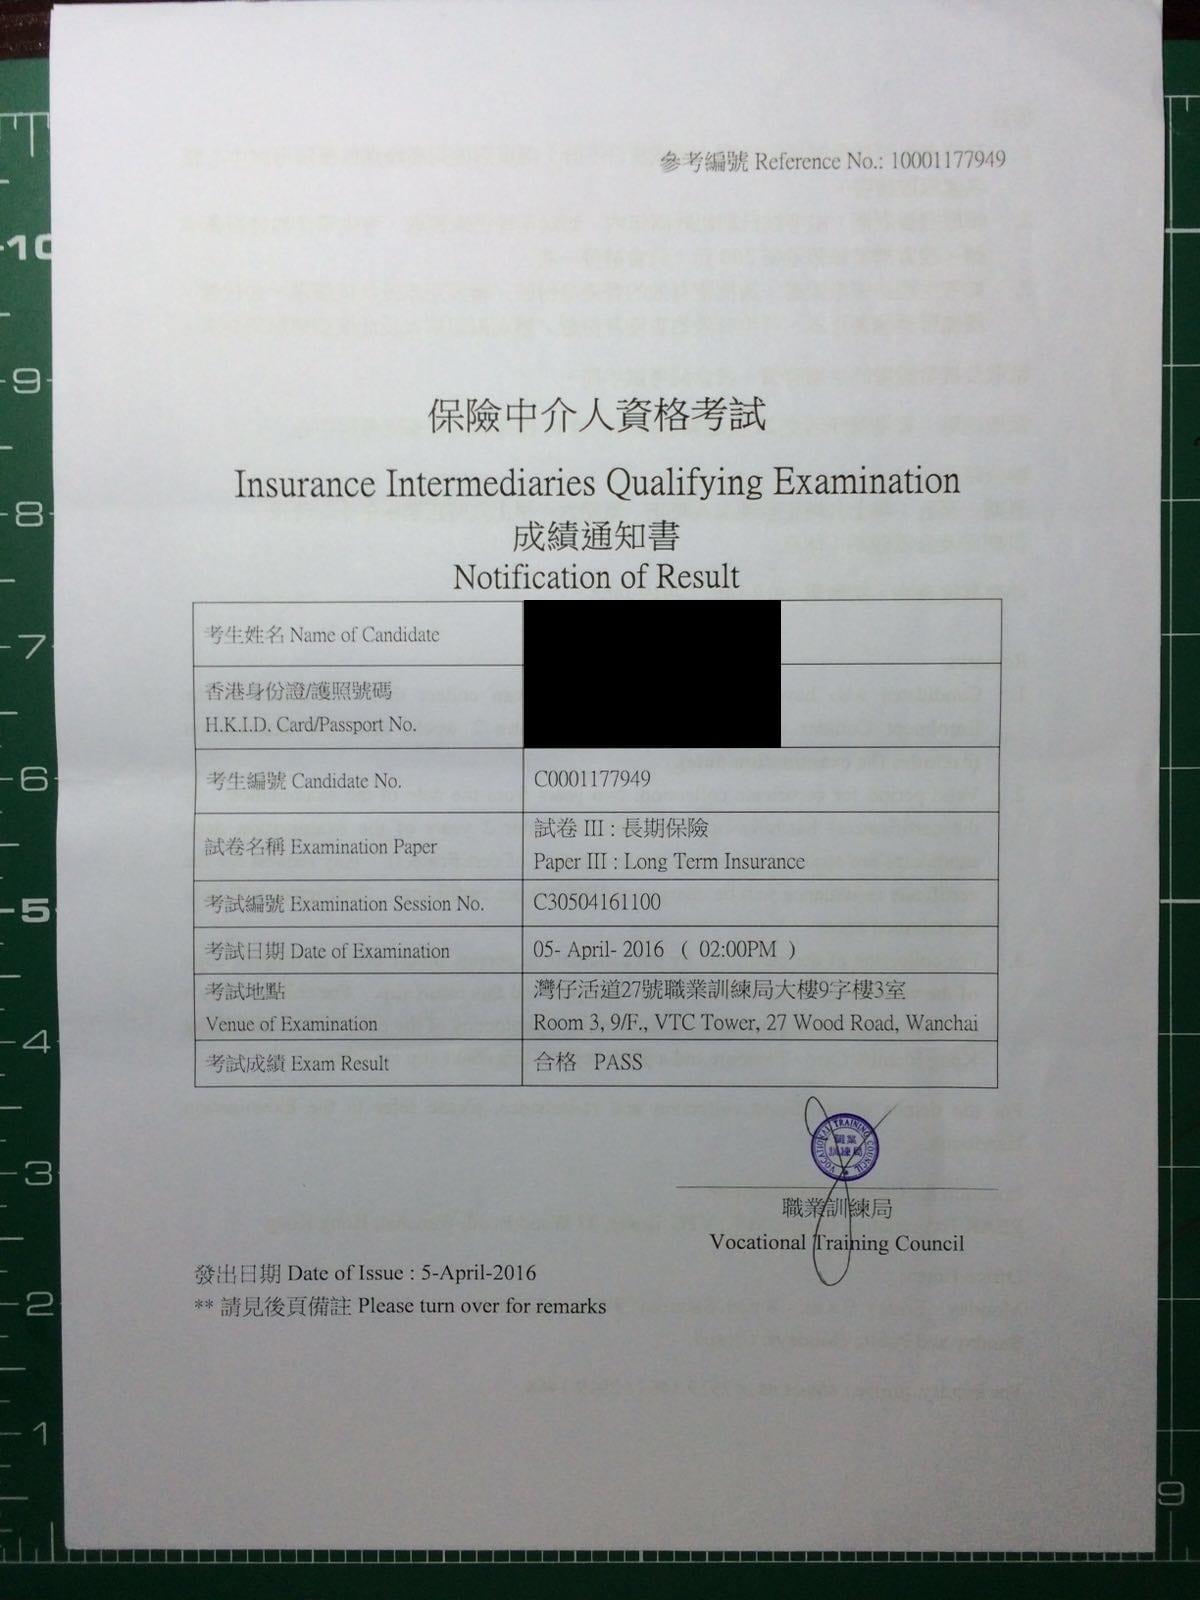 FHShum 5/4/2016 IIQE Paper 3 保險中介人資格考試卷三 Pass